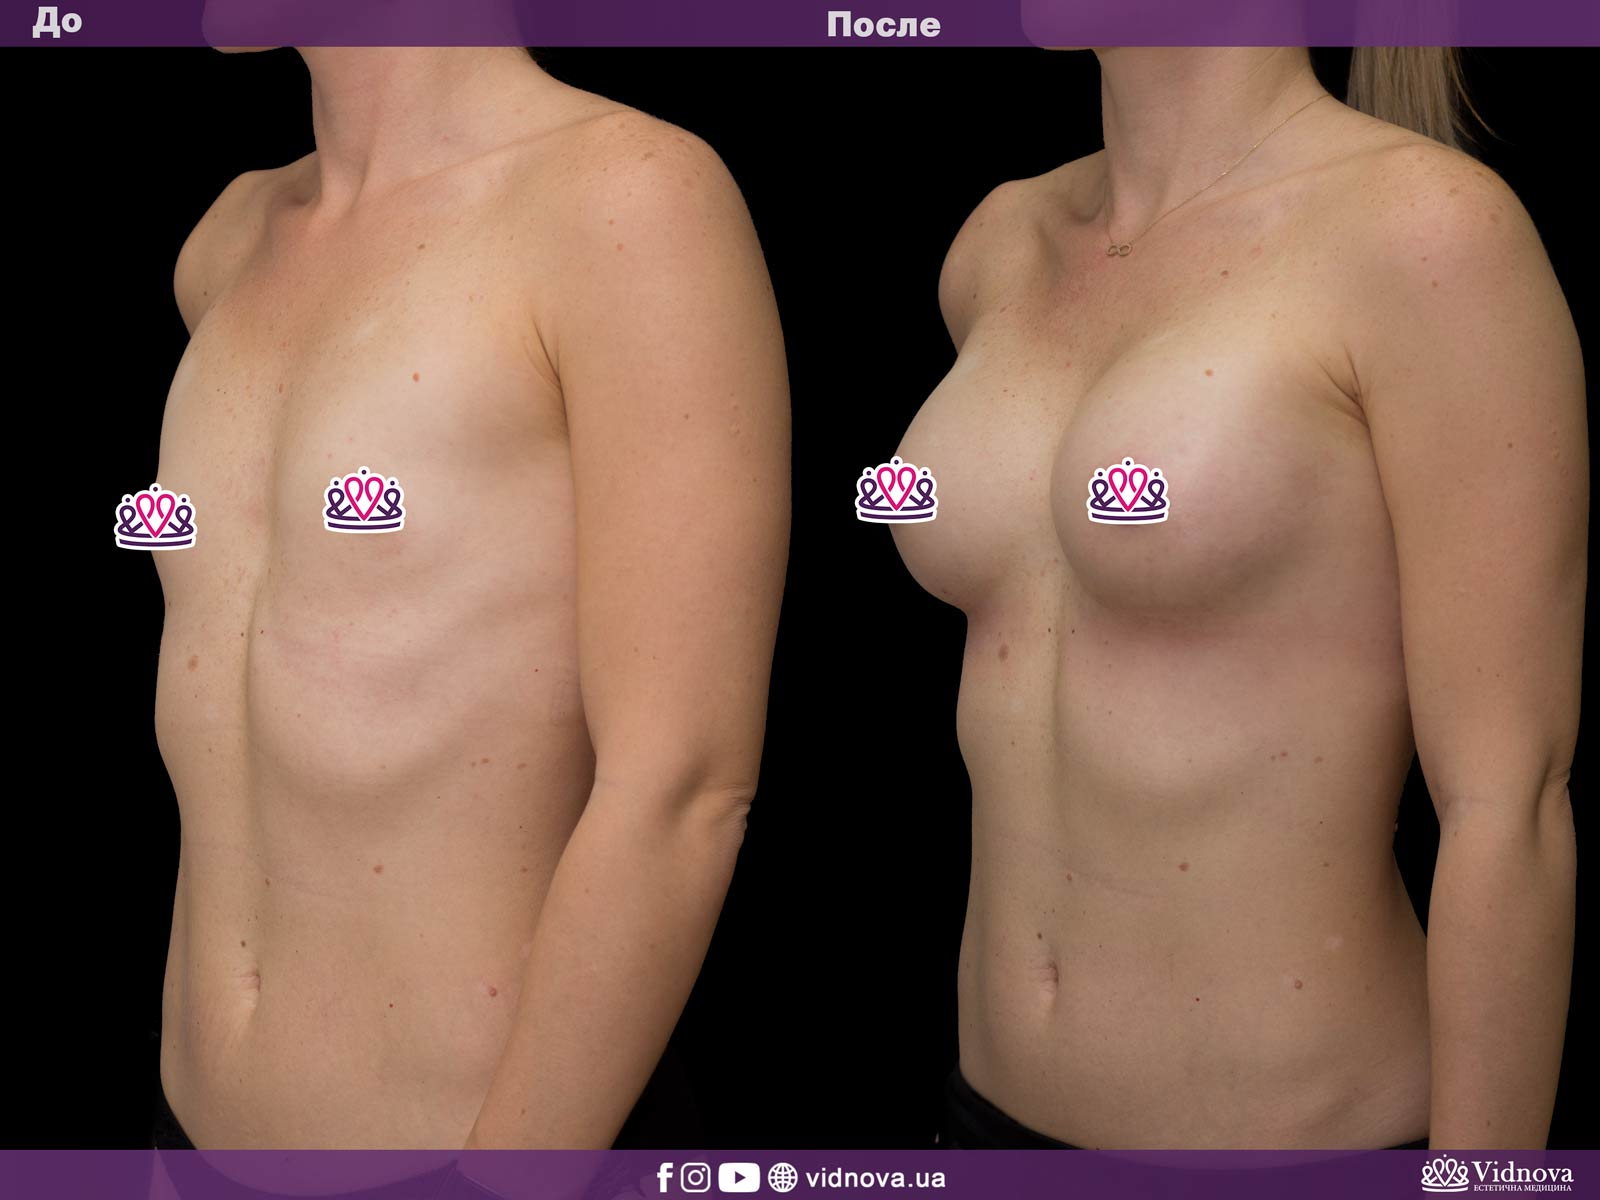 Увеличение груди: Фото ДО и ПОСЛЕ - Пример №35-2 - Клиника Vidnova